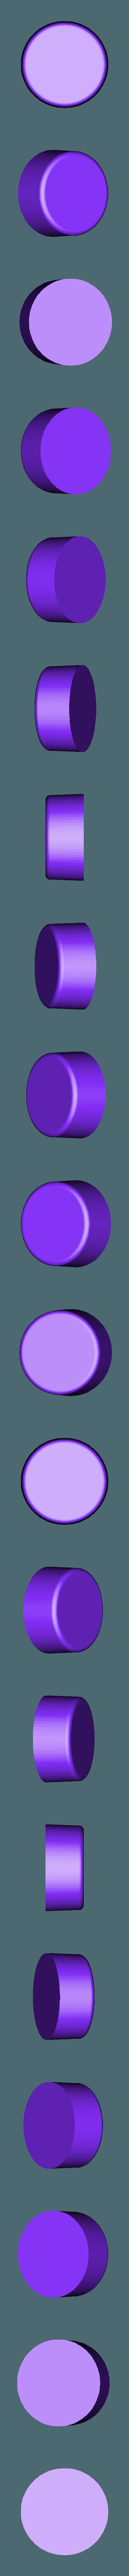 FEPbutton.stl Download free STL file Anycubic Photon FEP replacment Calibration Cap / Button • 3D printable model, BigMrTong